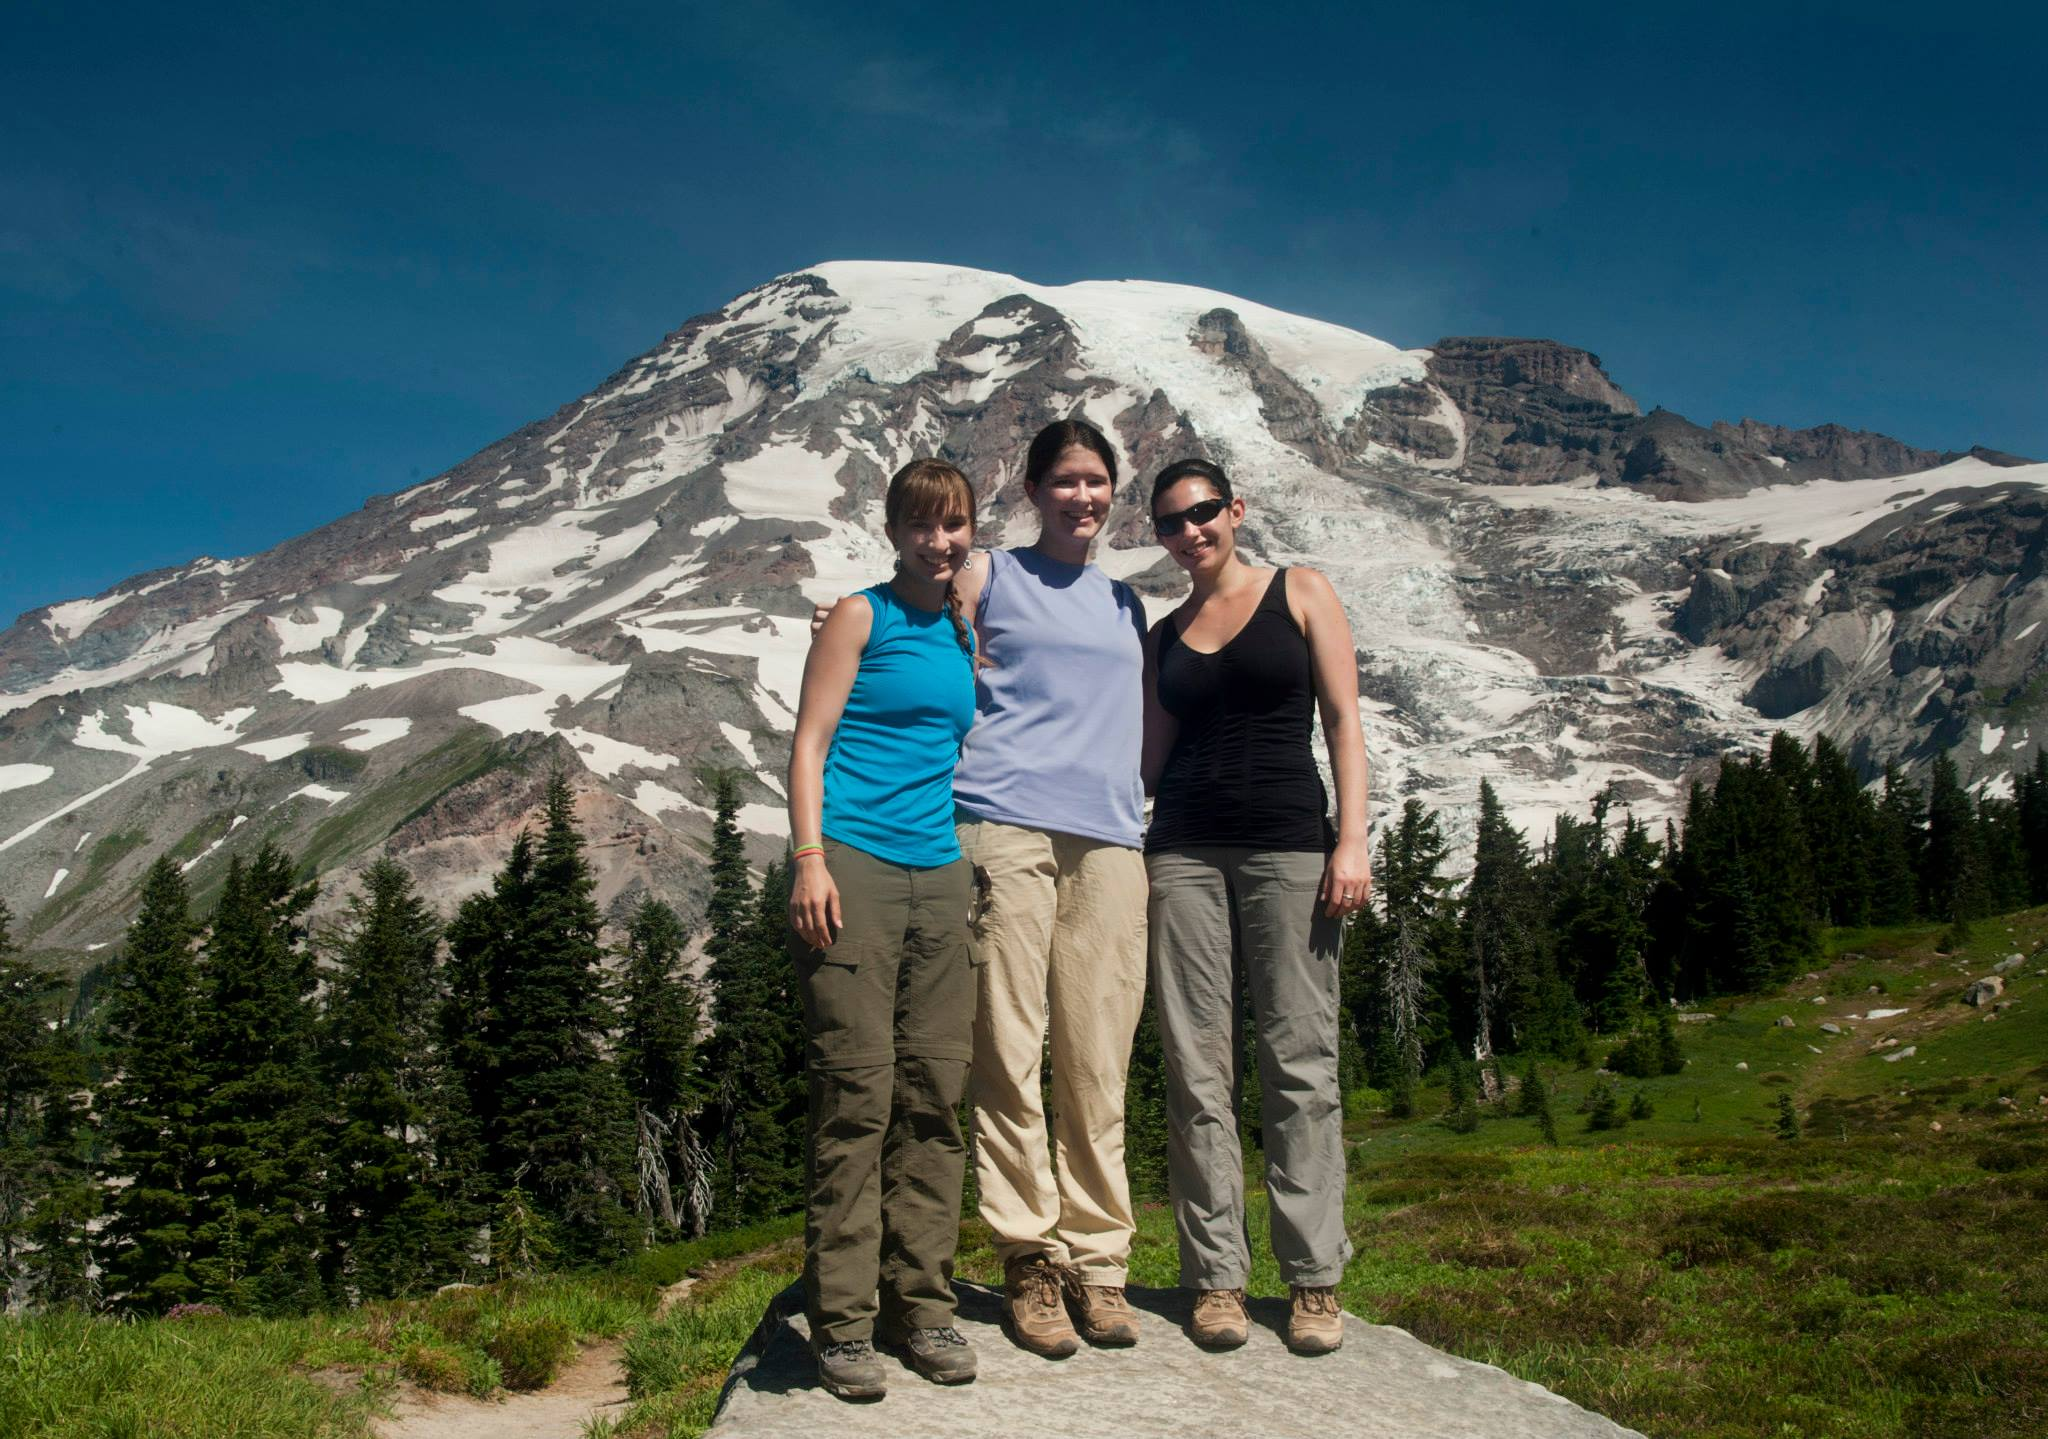 In front of Mt. Rainier, Washington